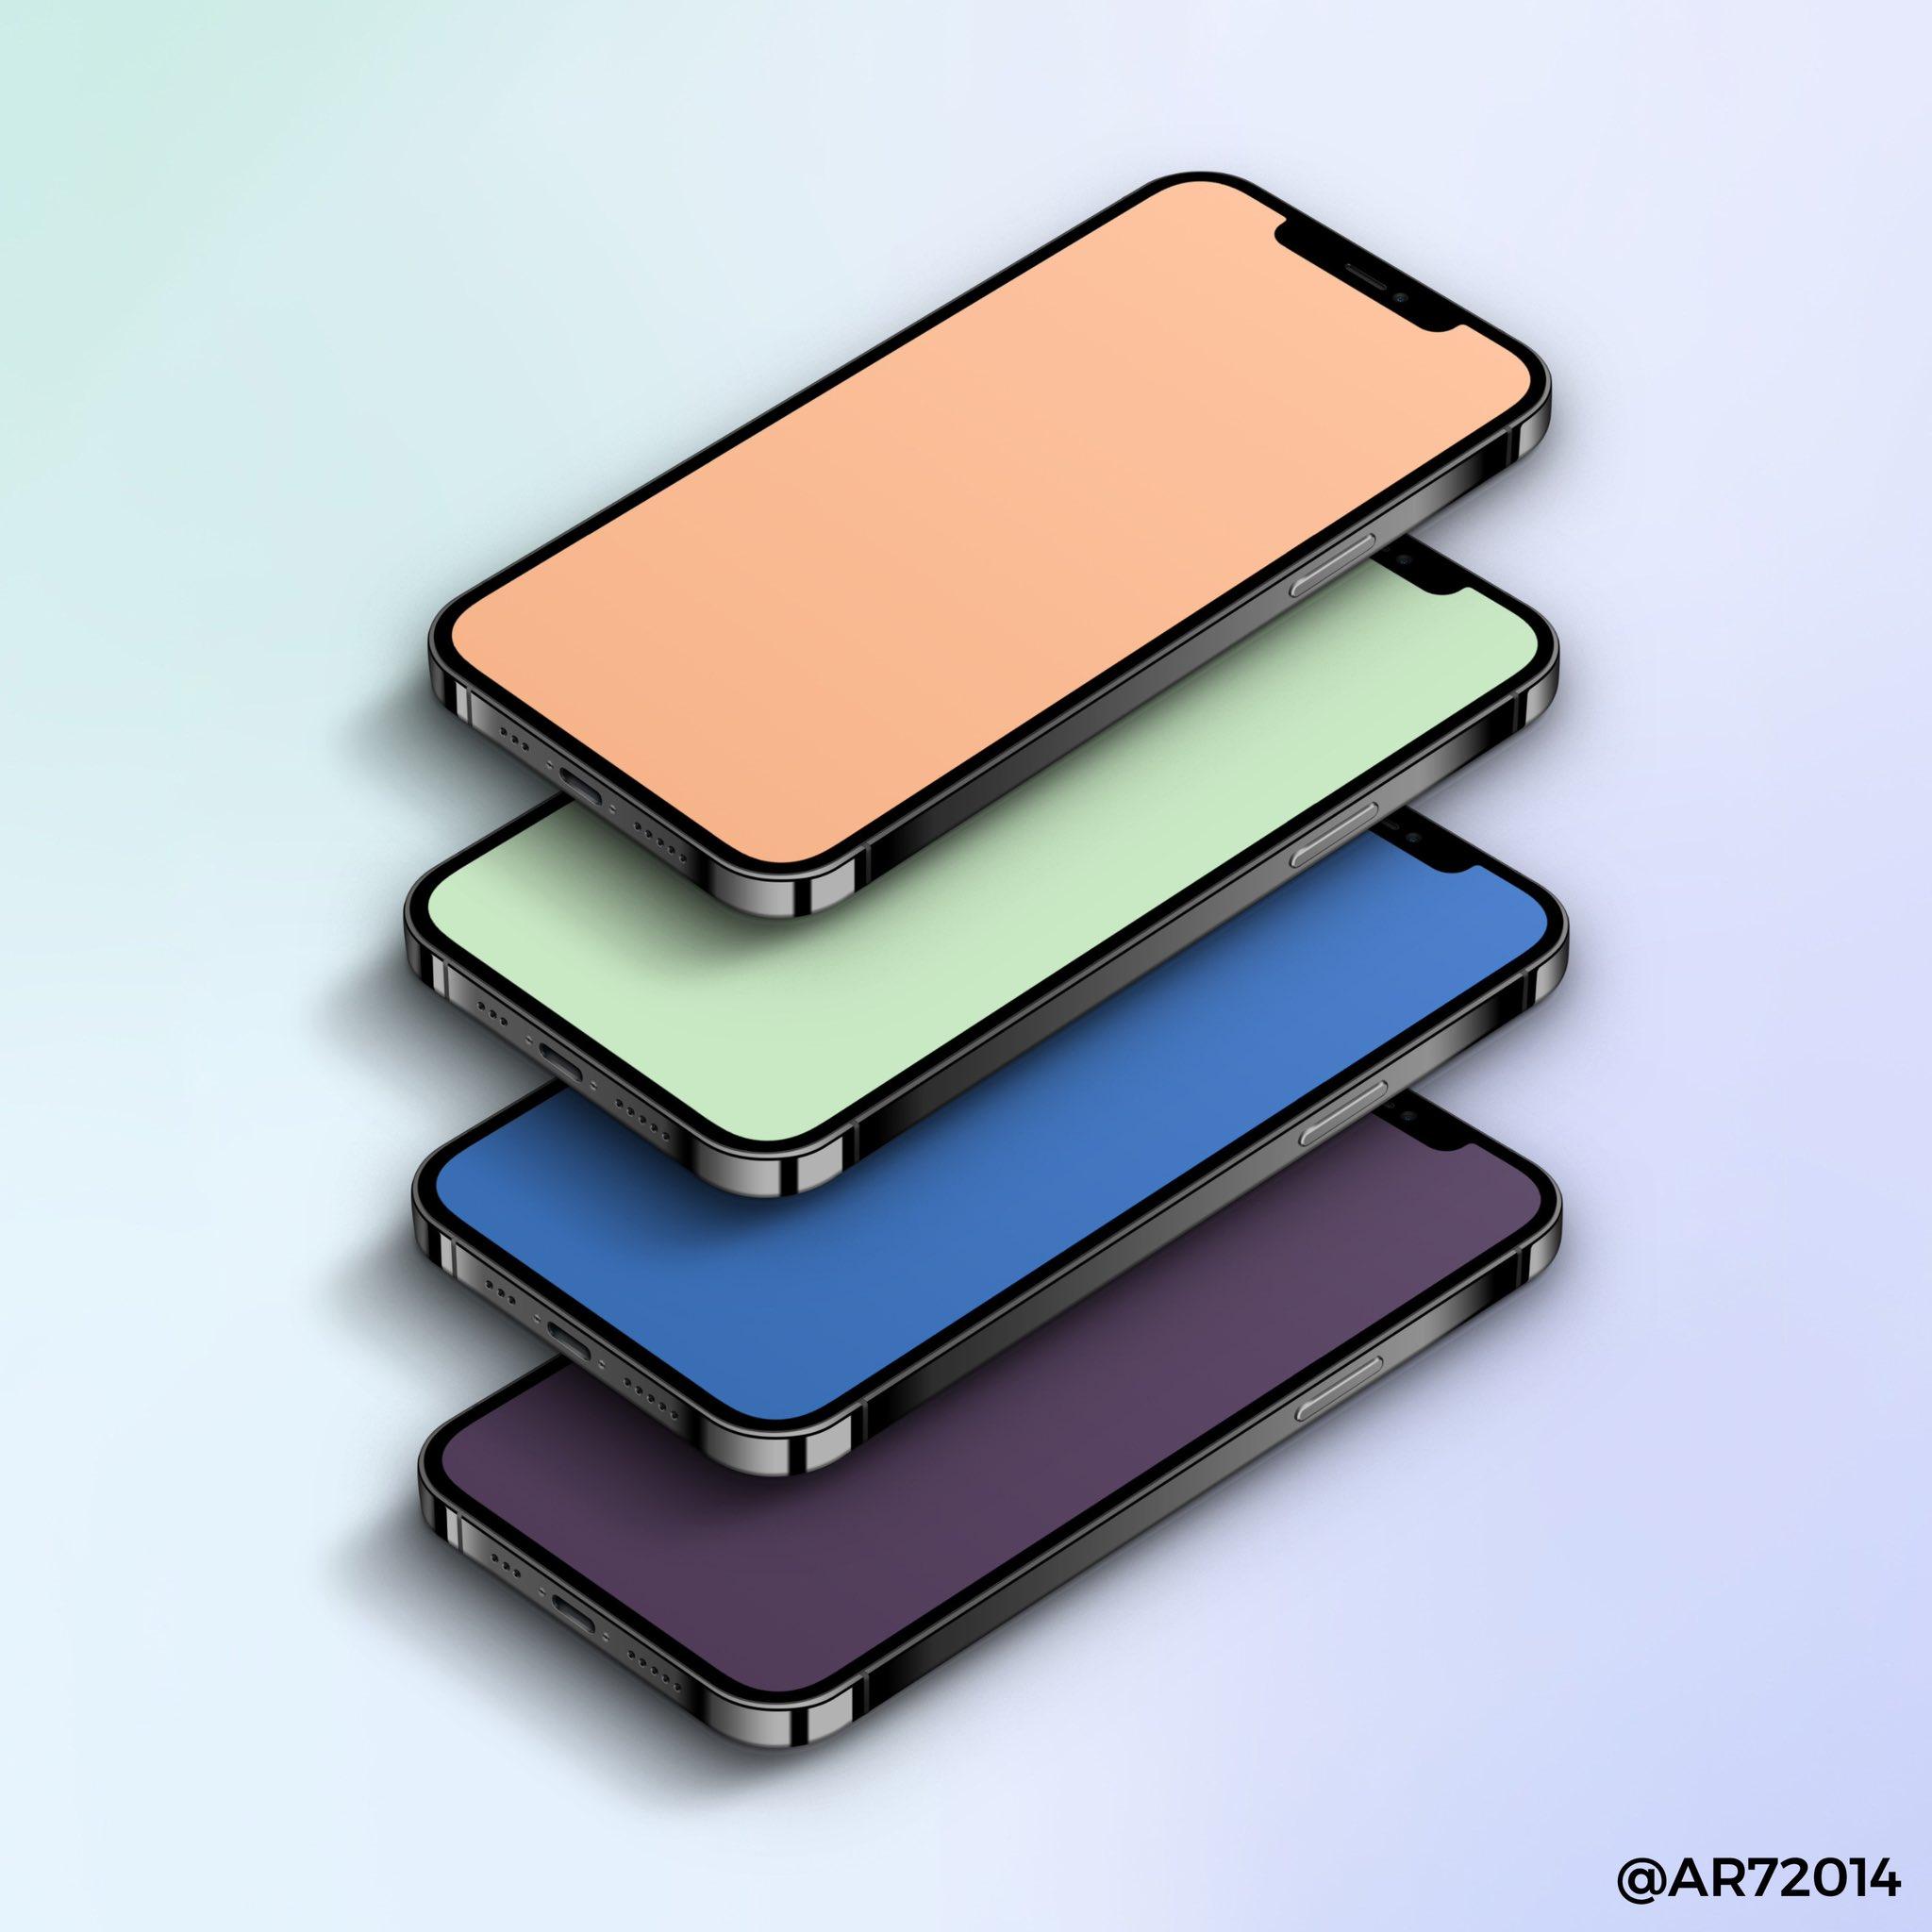 Spring-2021-magsafe-matching-color-iPhone-wallpaper-AR72014-mockup